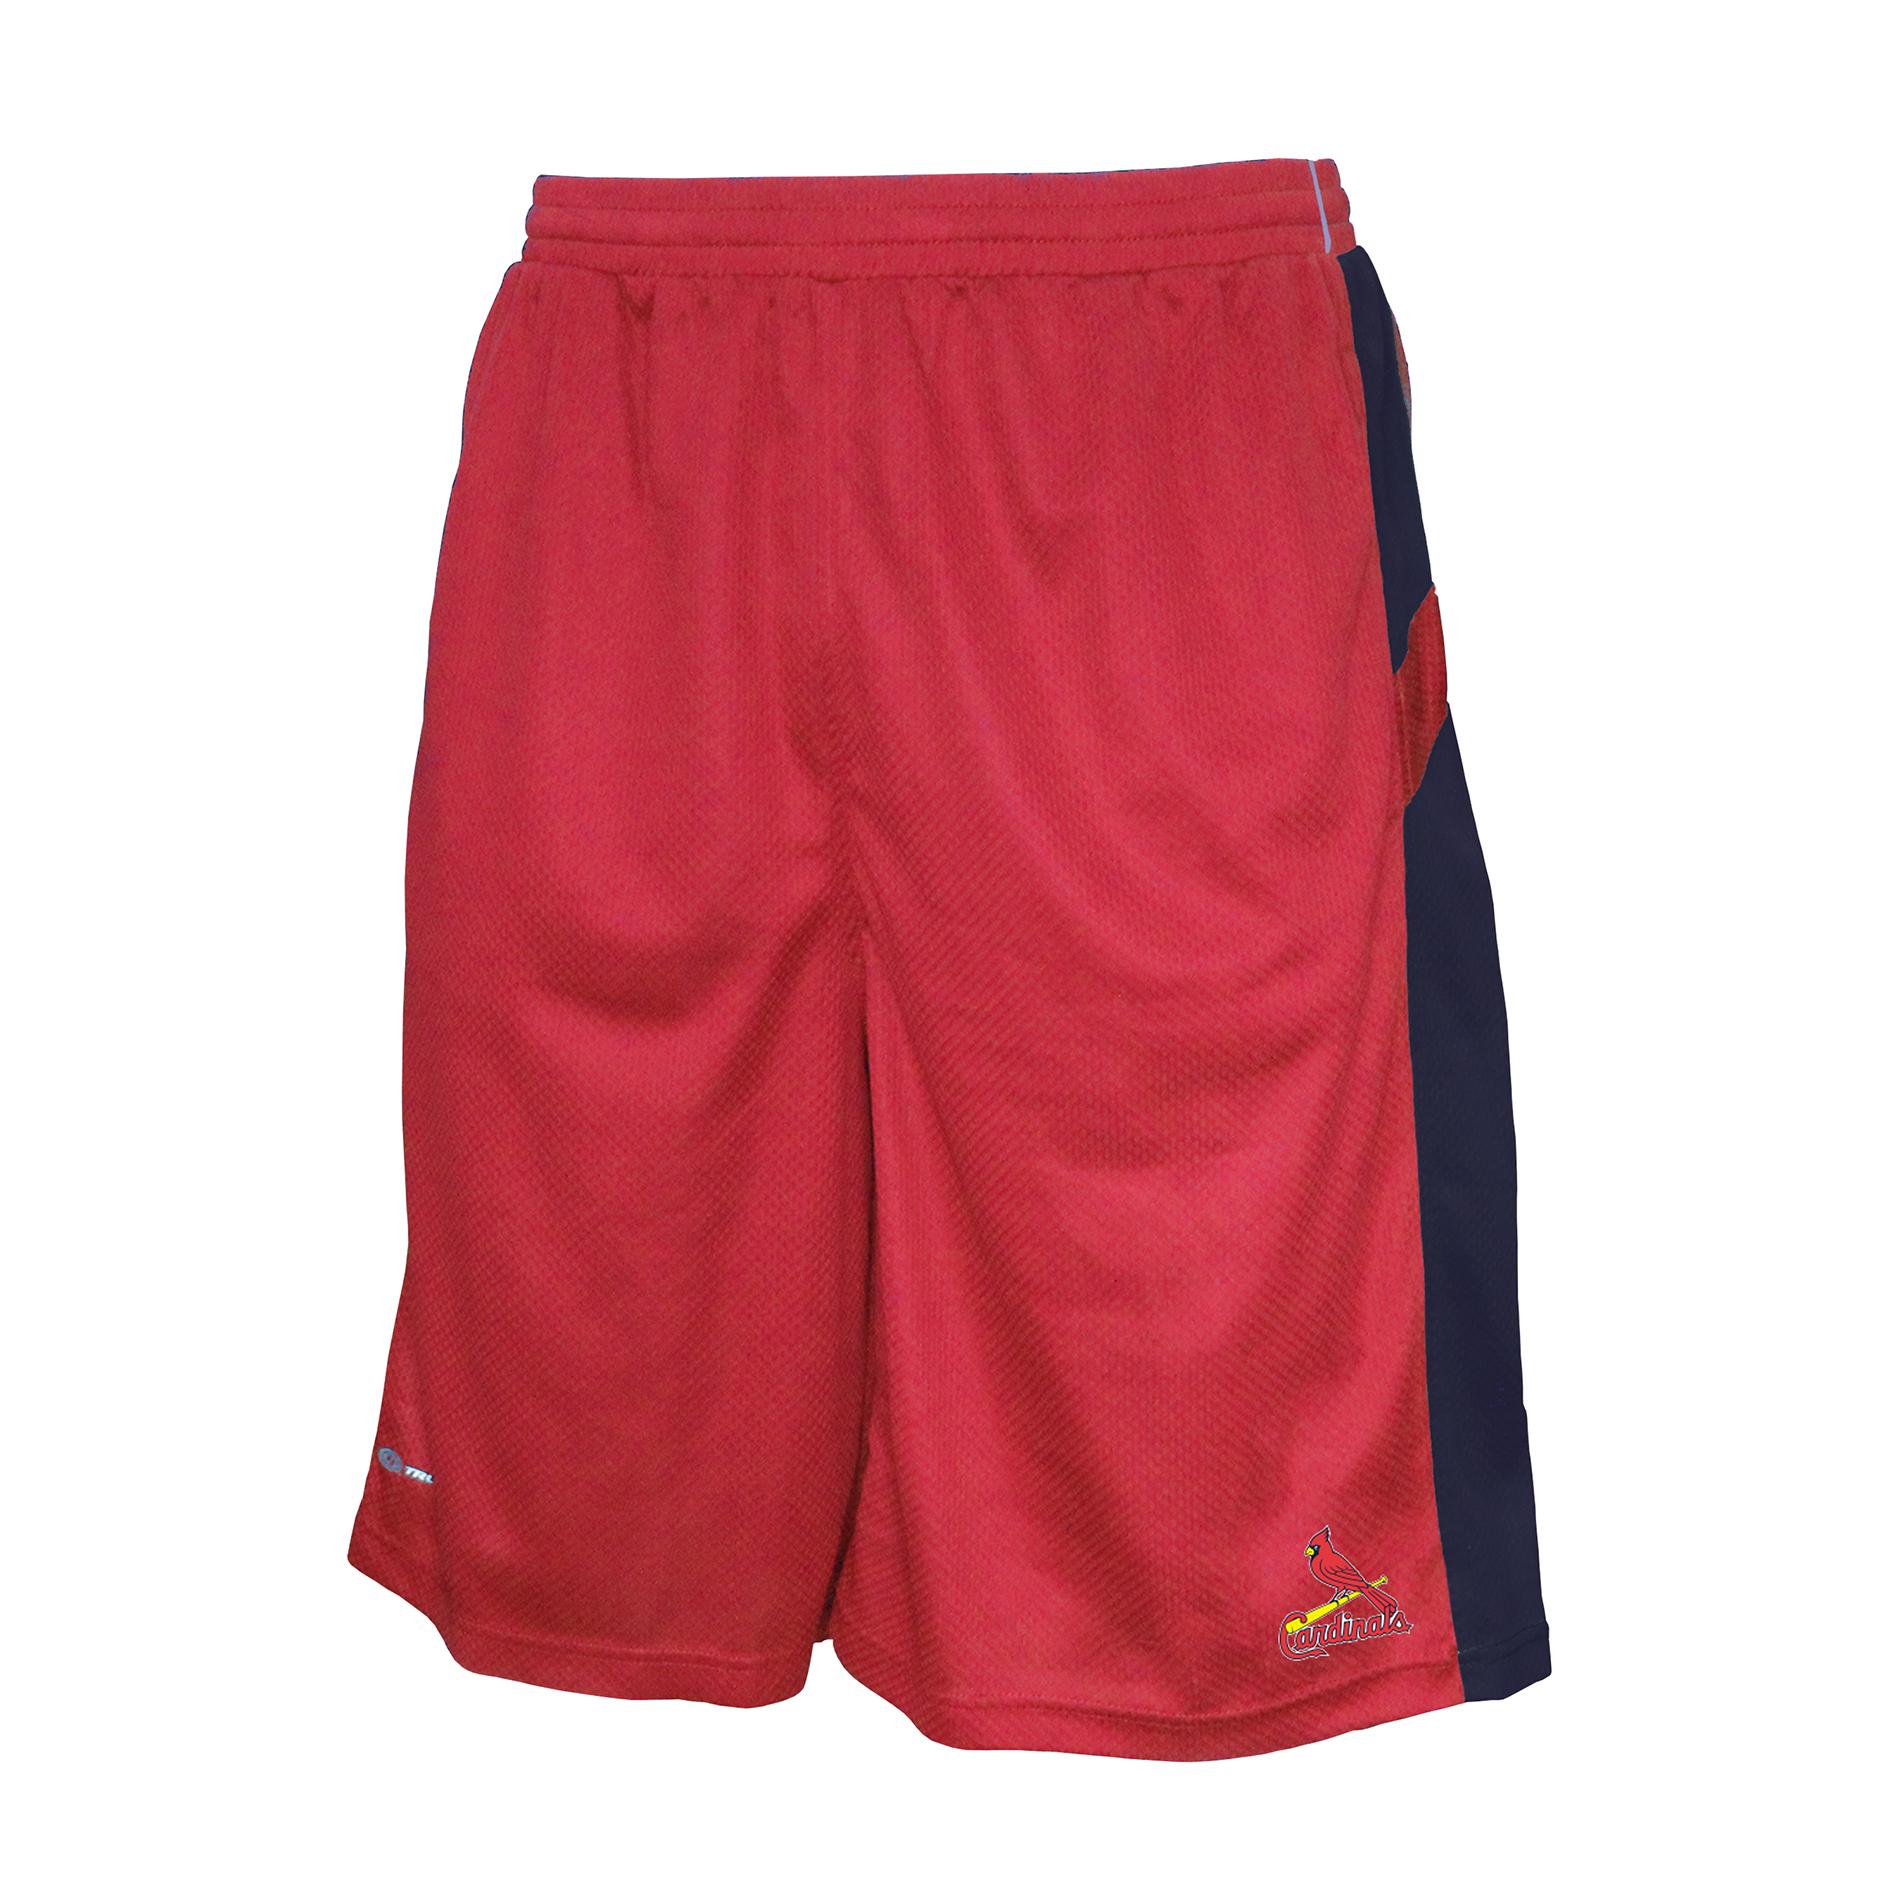 MLB St. Louis Cardinals Mesh Shorts PartNumber: 046VA87922712P MfgPartNumber: 44228M26E53